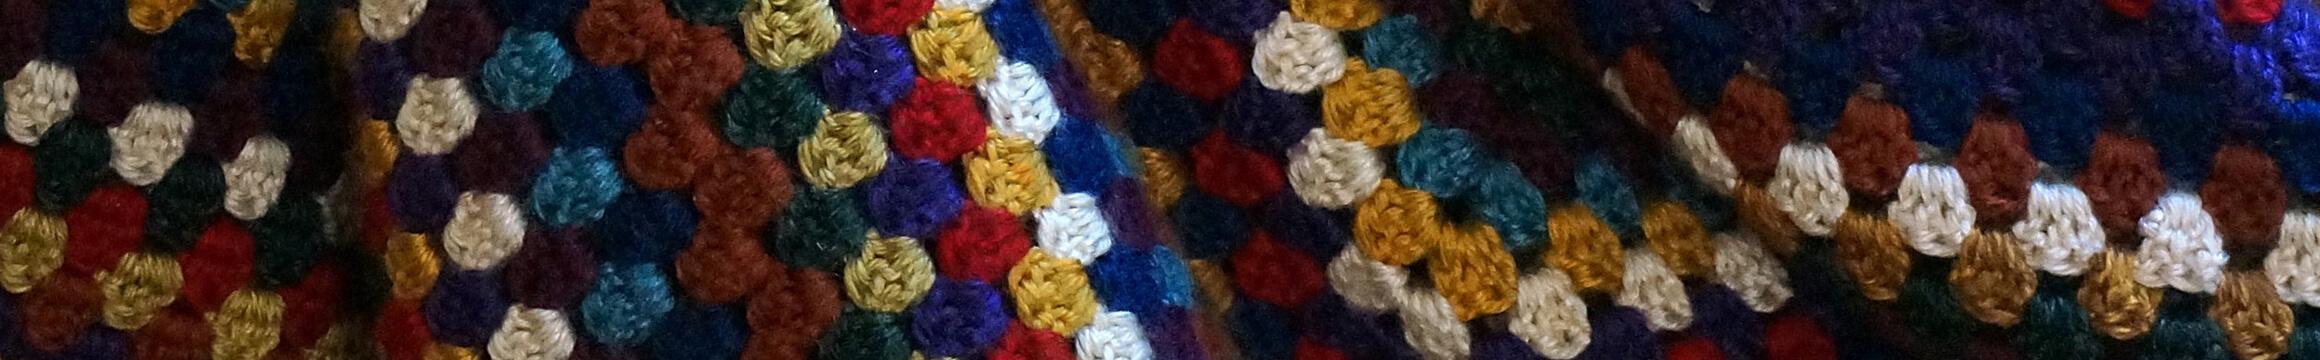 Crochet 01